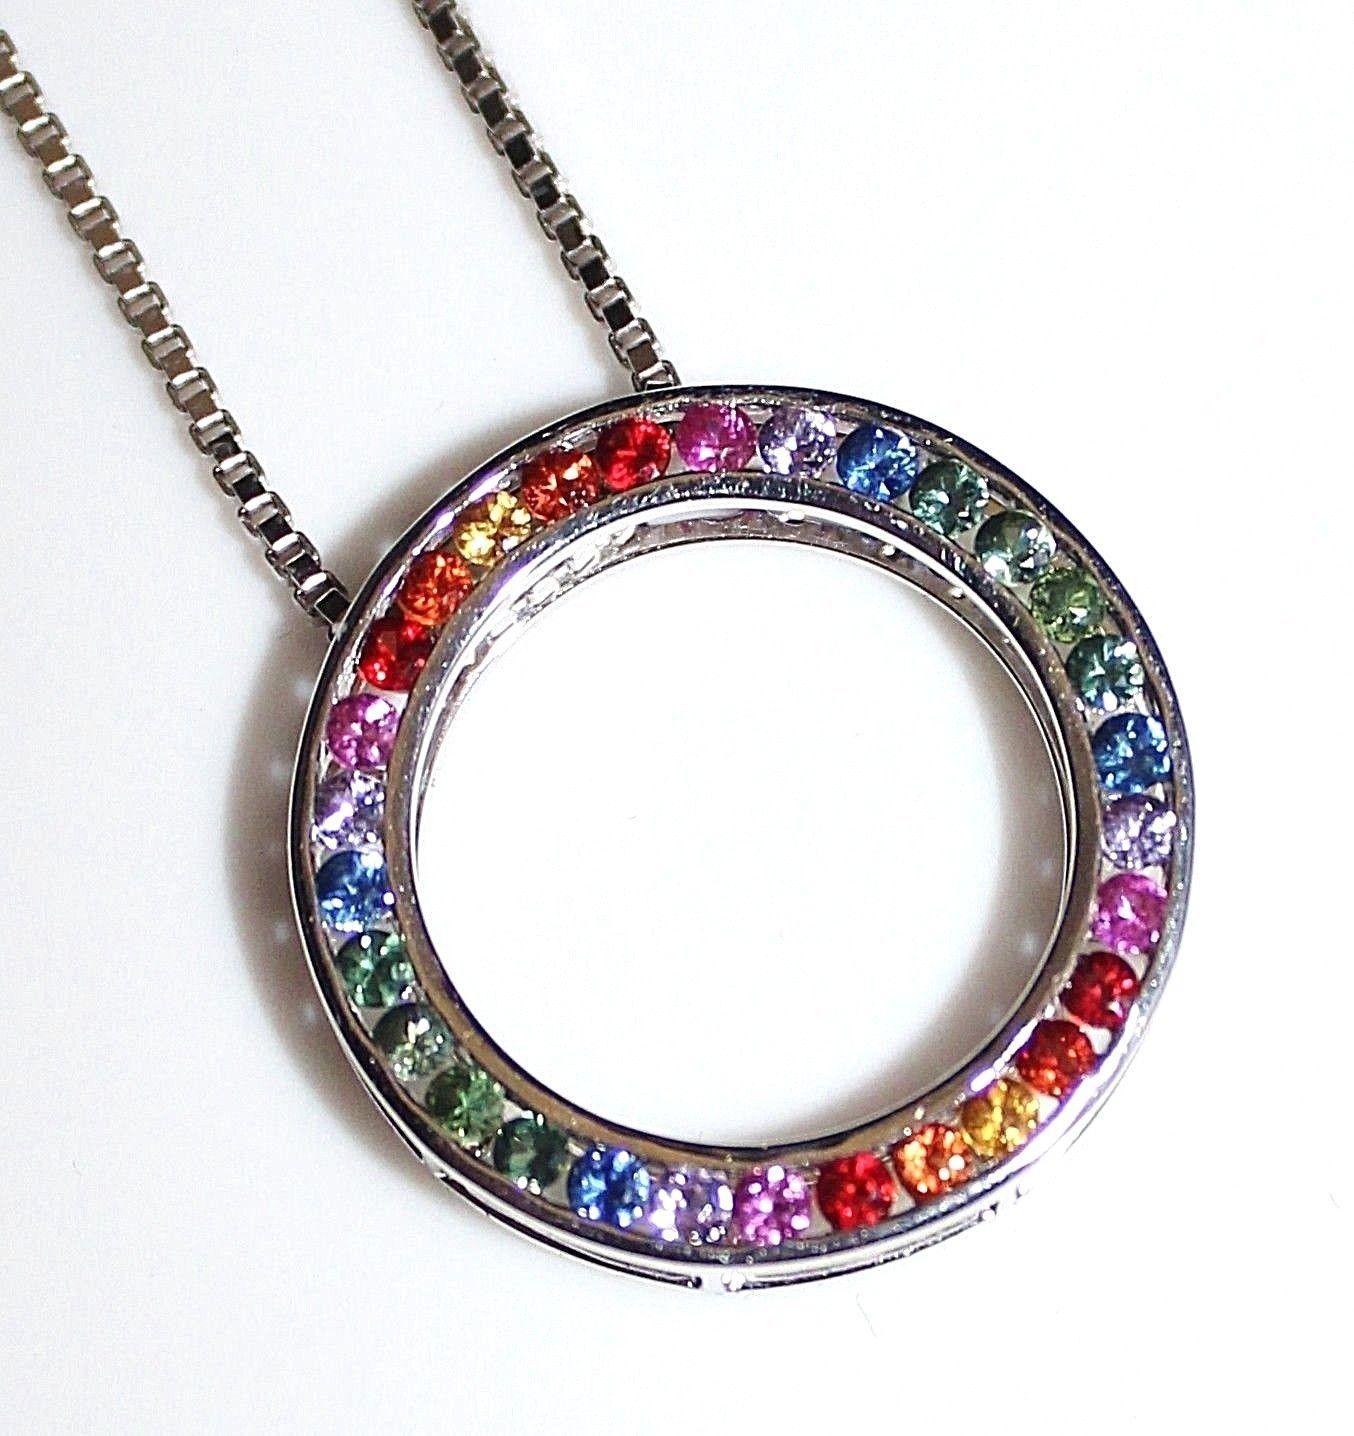 Brilliant 14k white gold rainbow sapphire circle pendant necklace brilliant 14k white gold rainbow sapphire circle pendant necklace 120ctw 64g mozeypictures Gallery